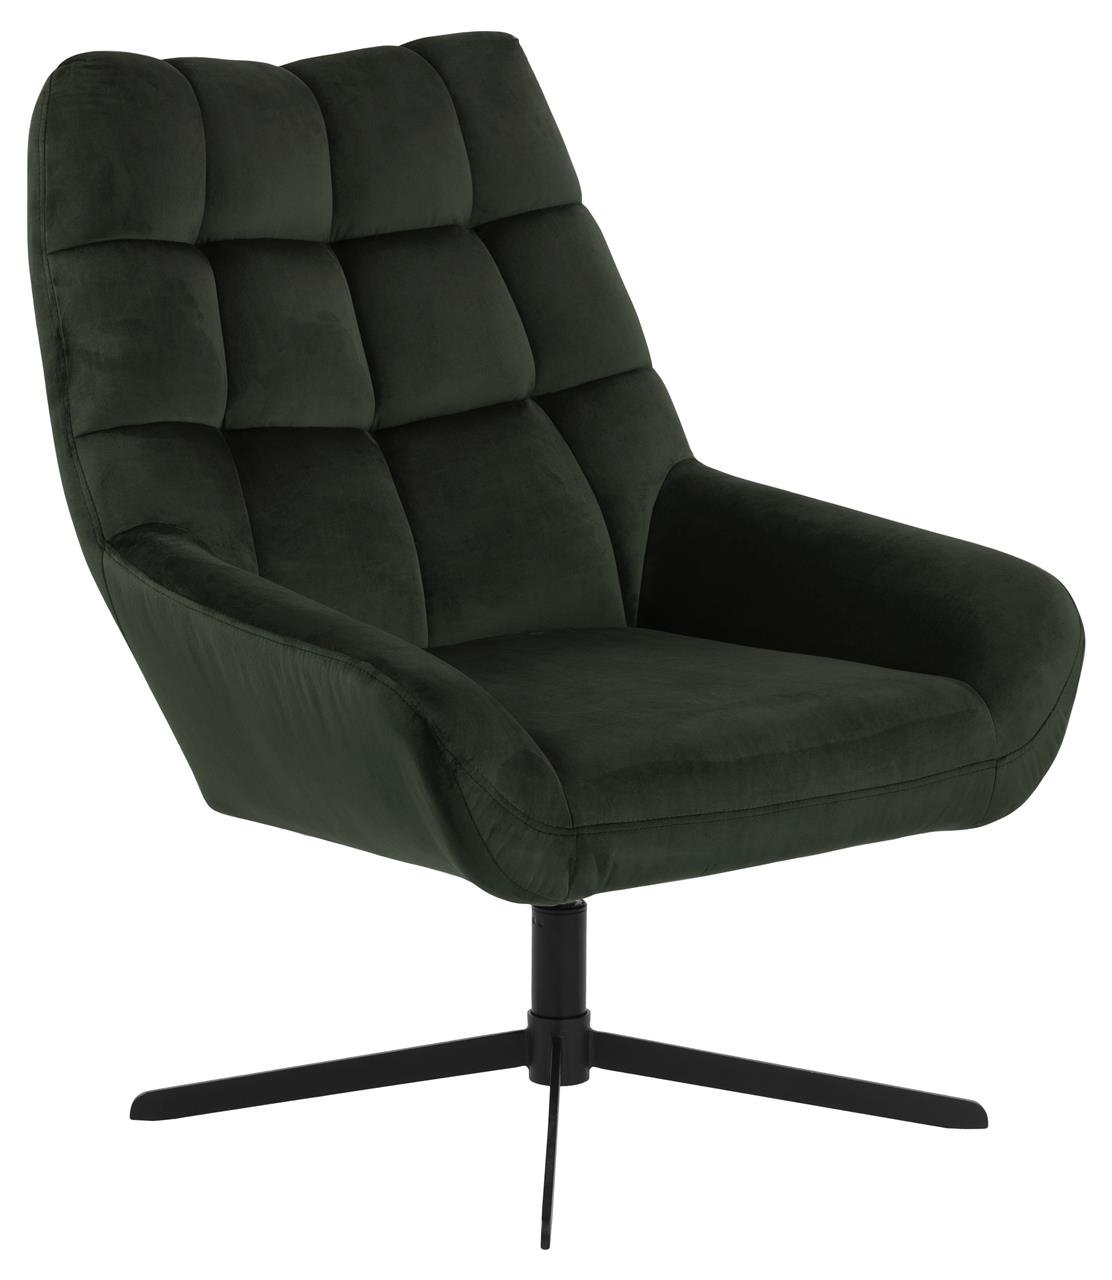 Fotoliu rotativ tapitat cu stofa si picioare metalice Paris Velvet Verde Inchis / Negru, l73xA82xH88 cm imagine